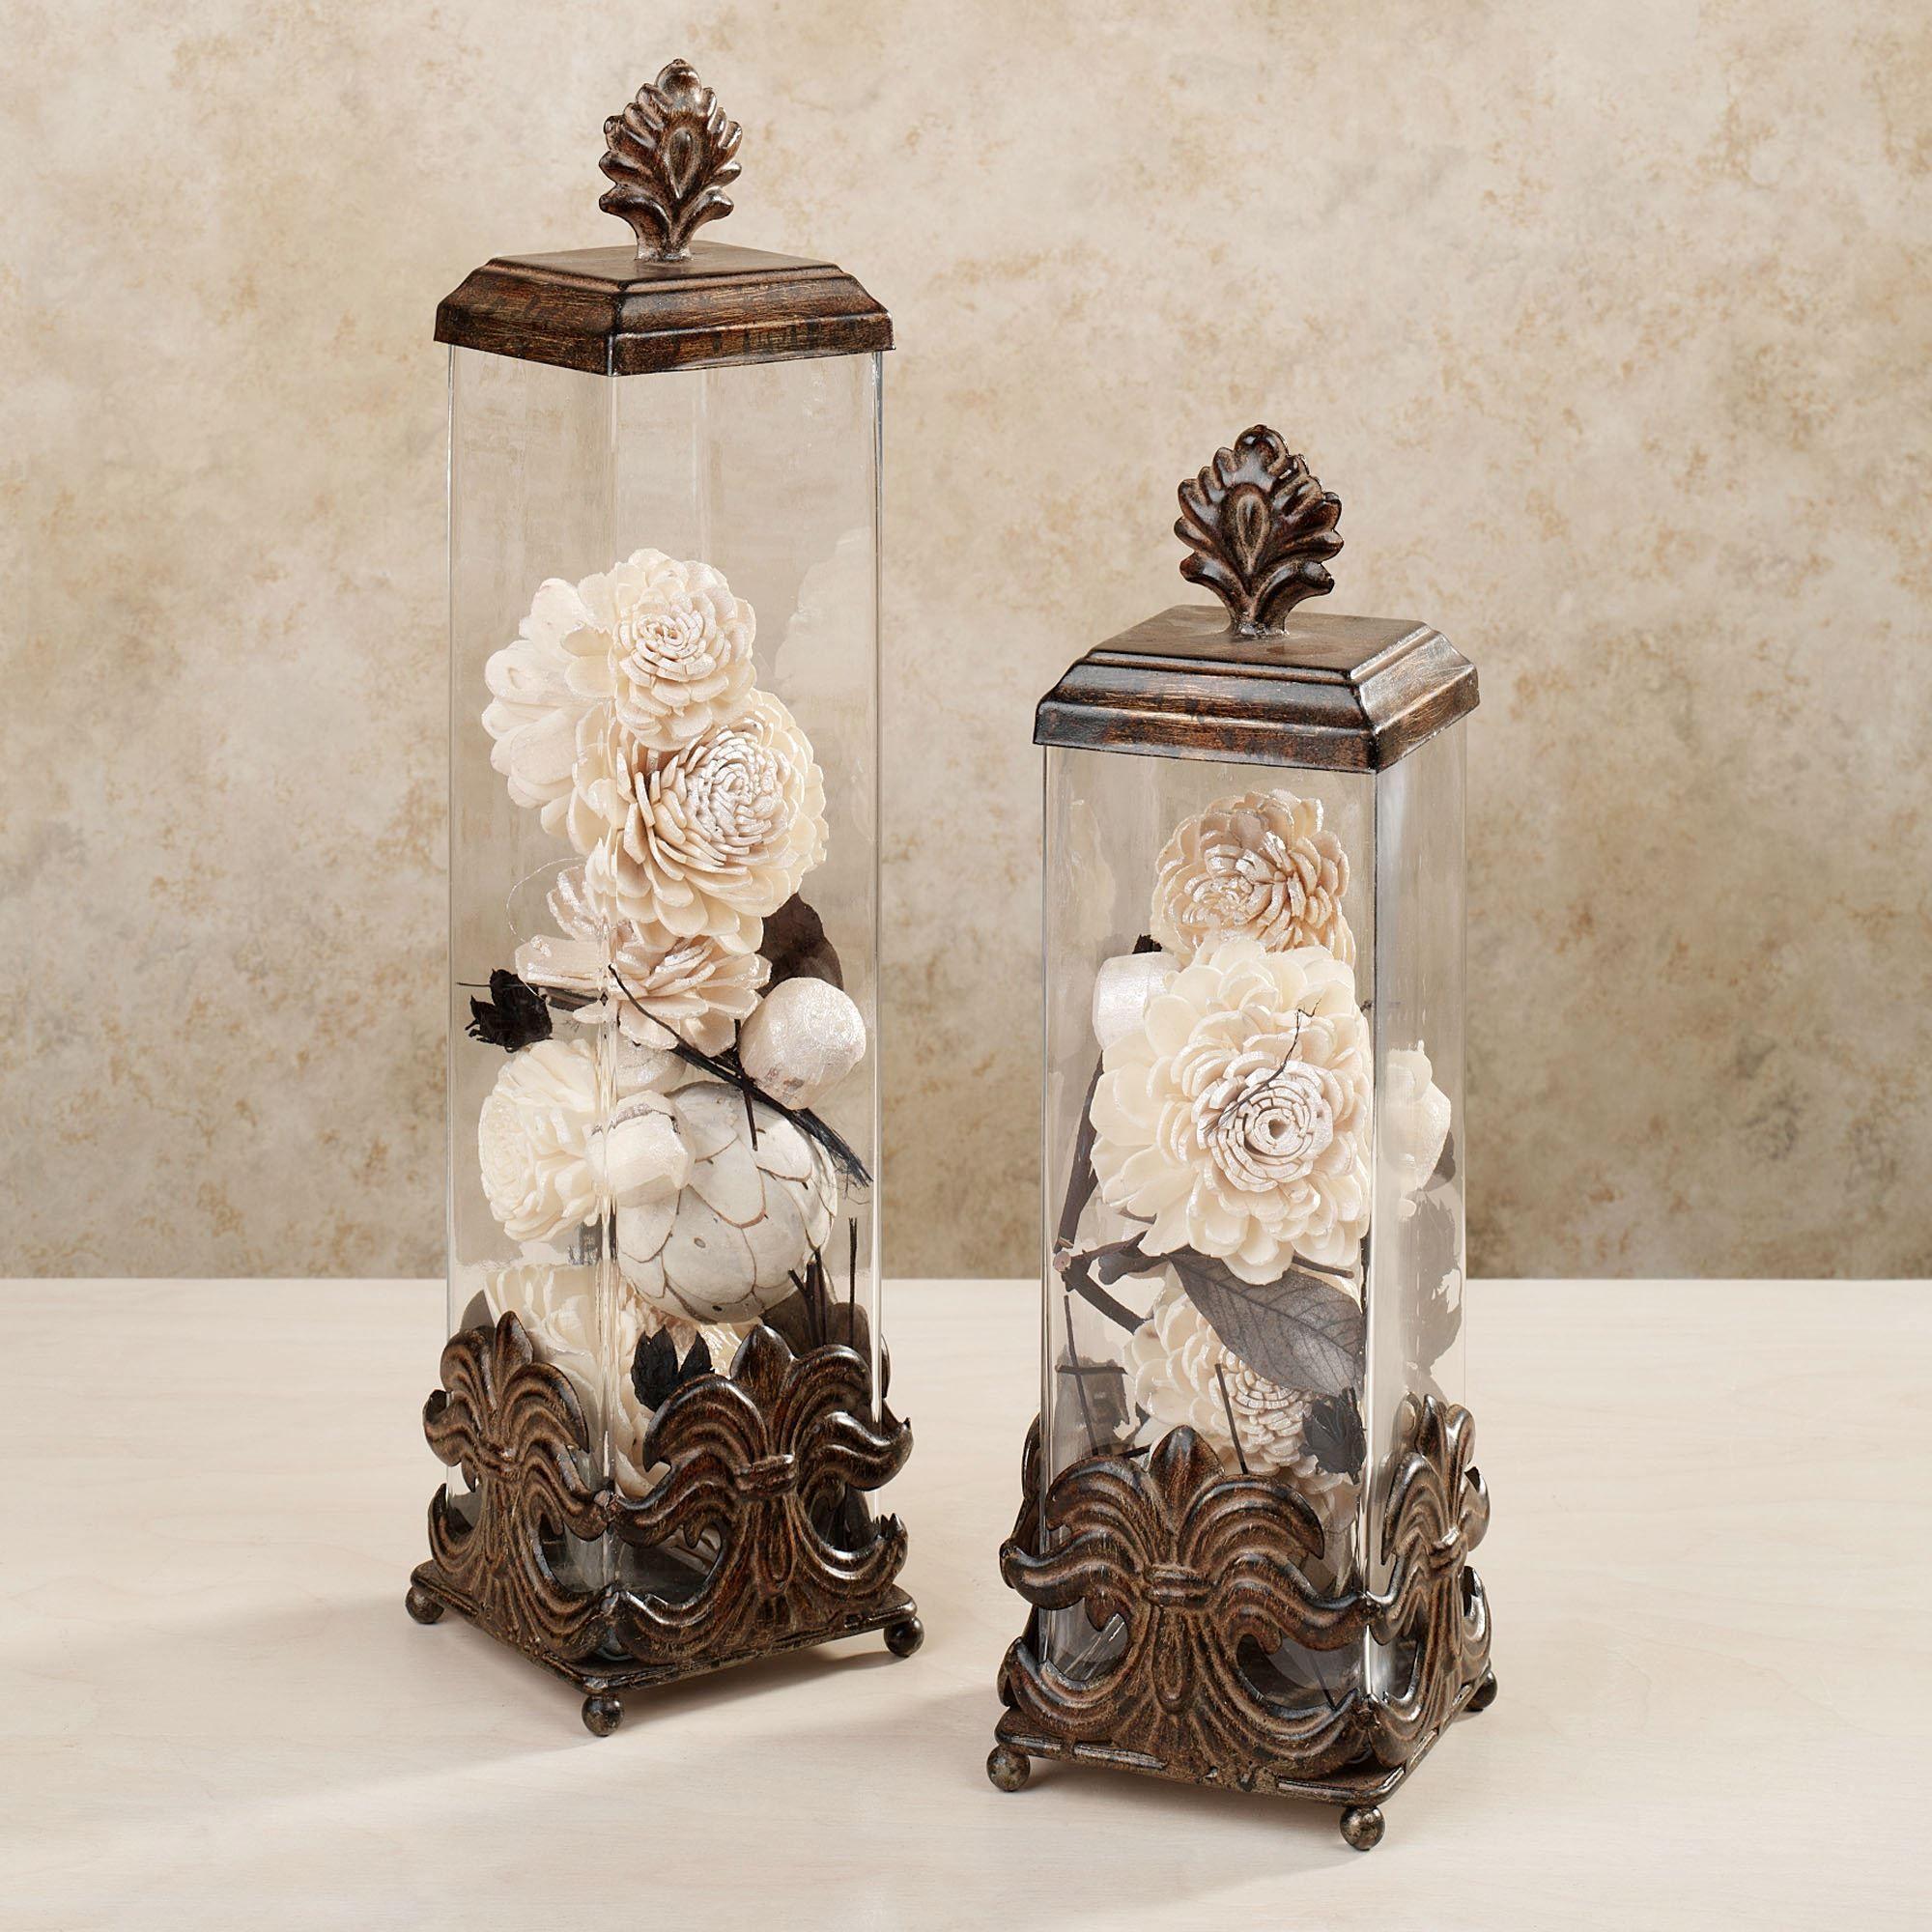 Herston Decorative Covered Jar Set